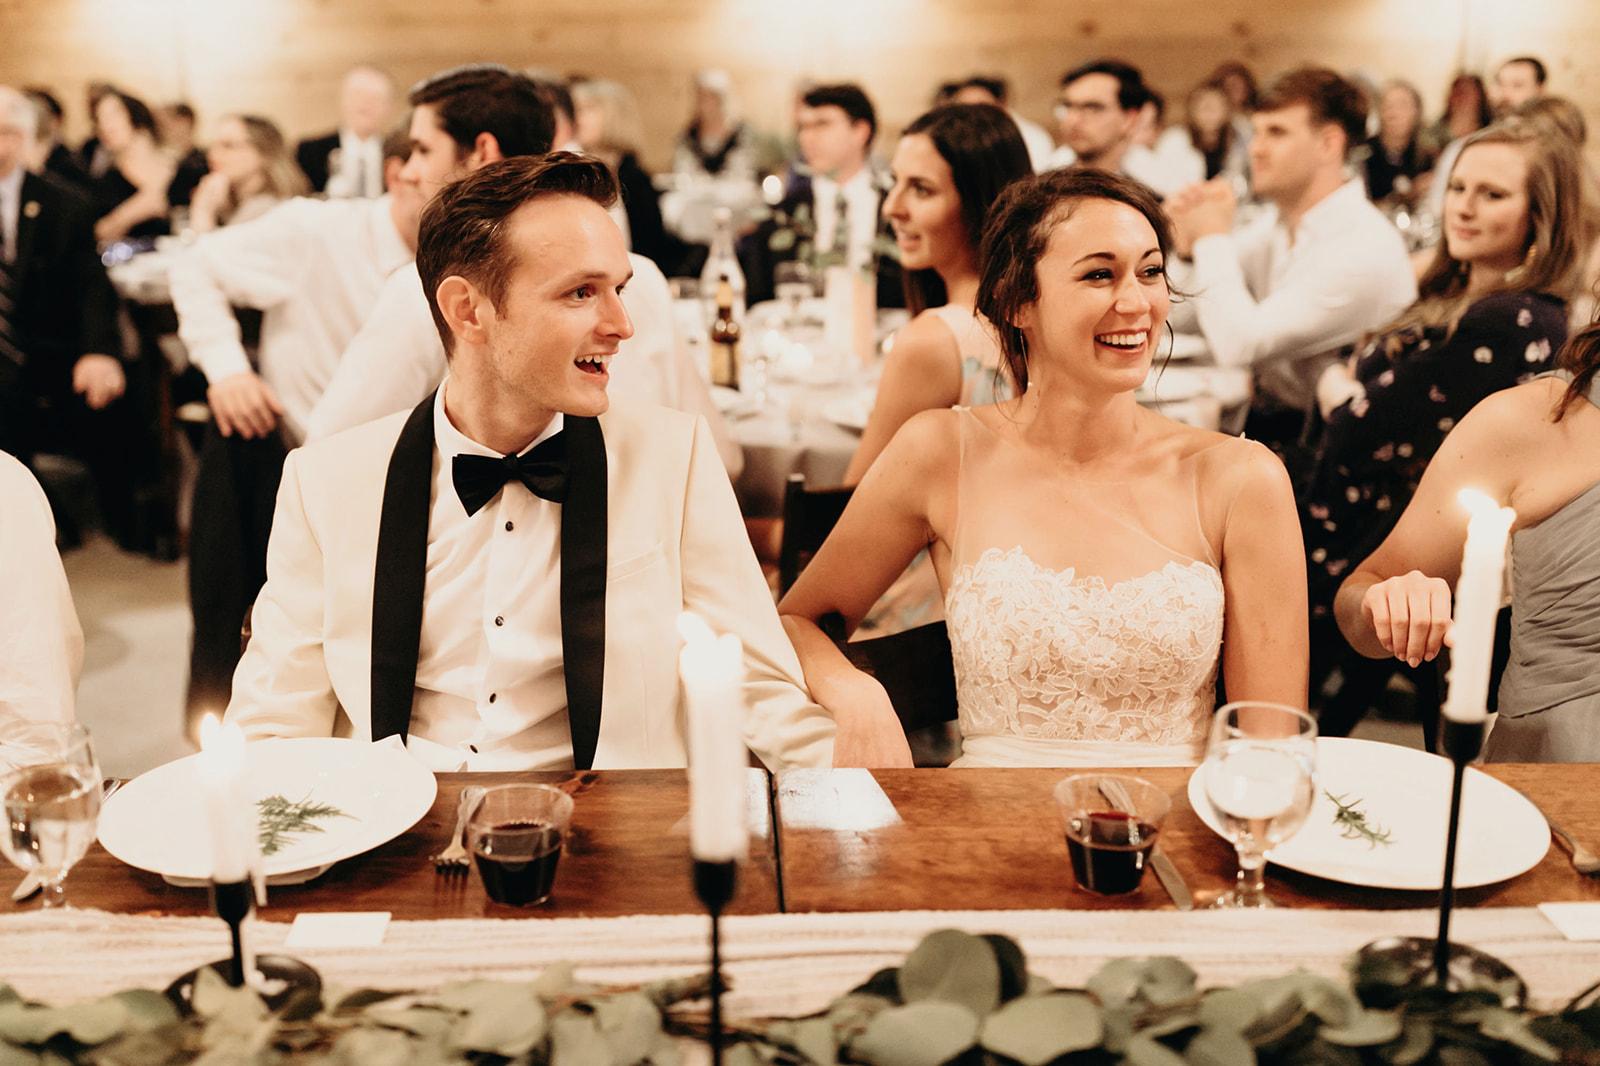 austin-wedding-lindsey-bryce-741.jpg